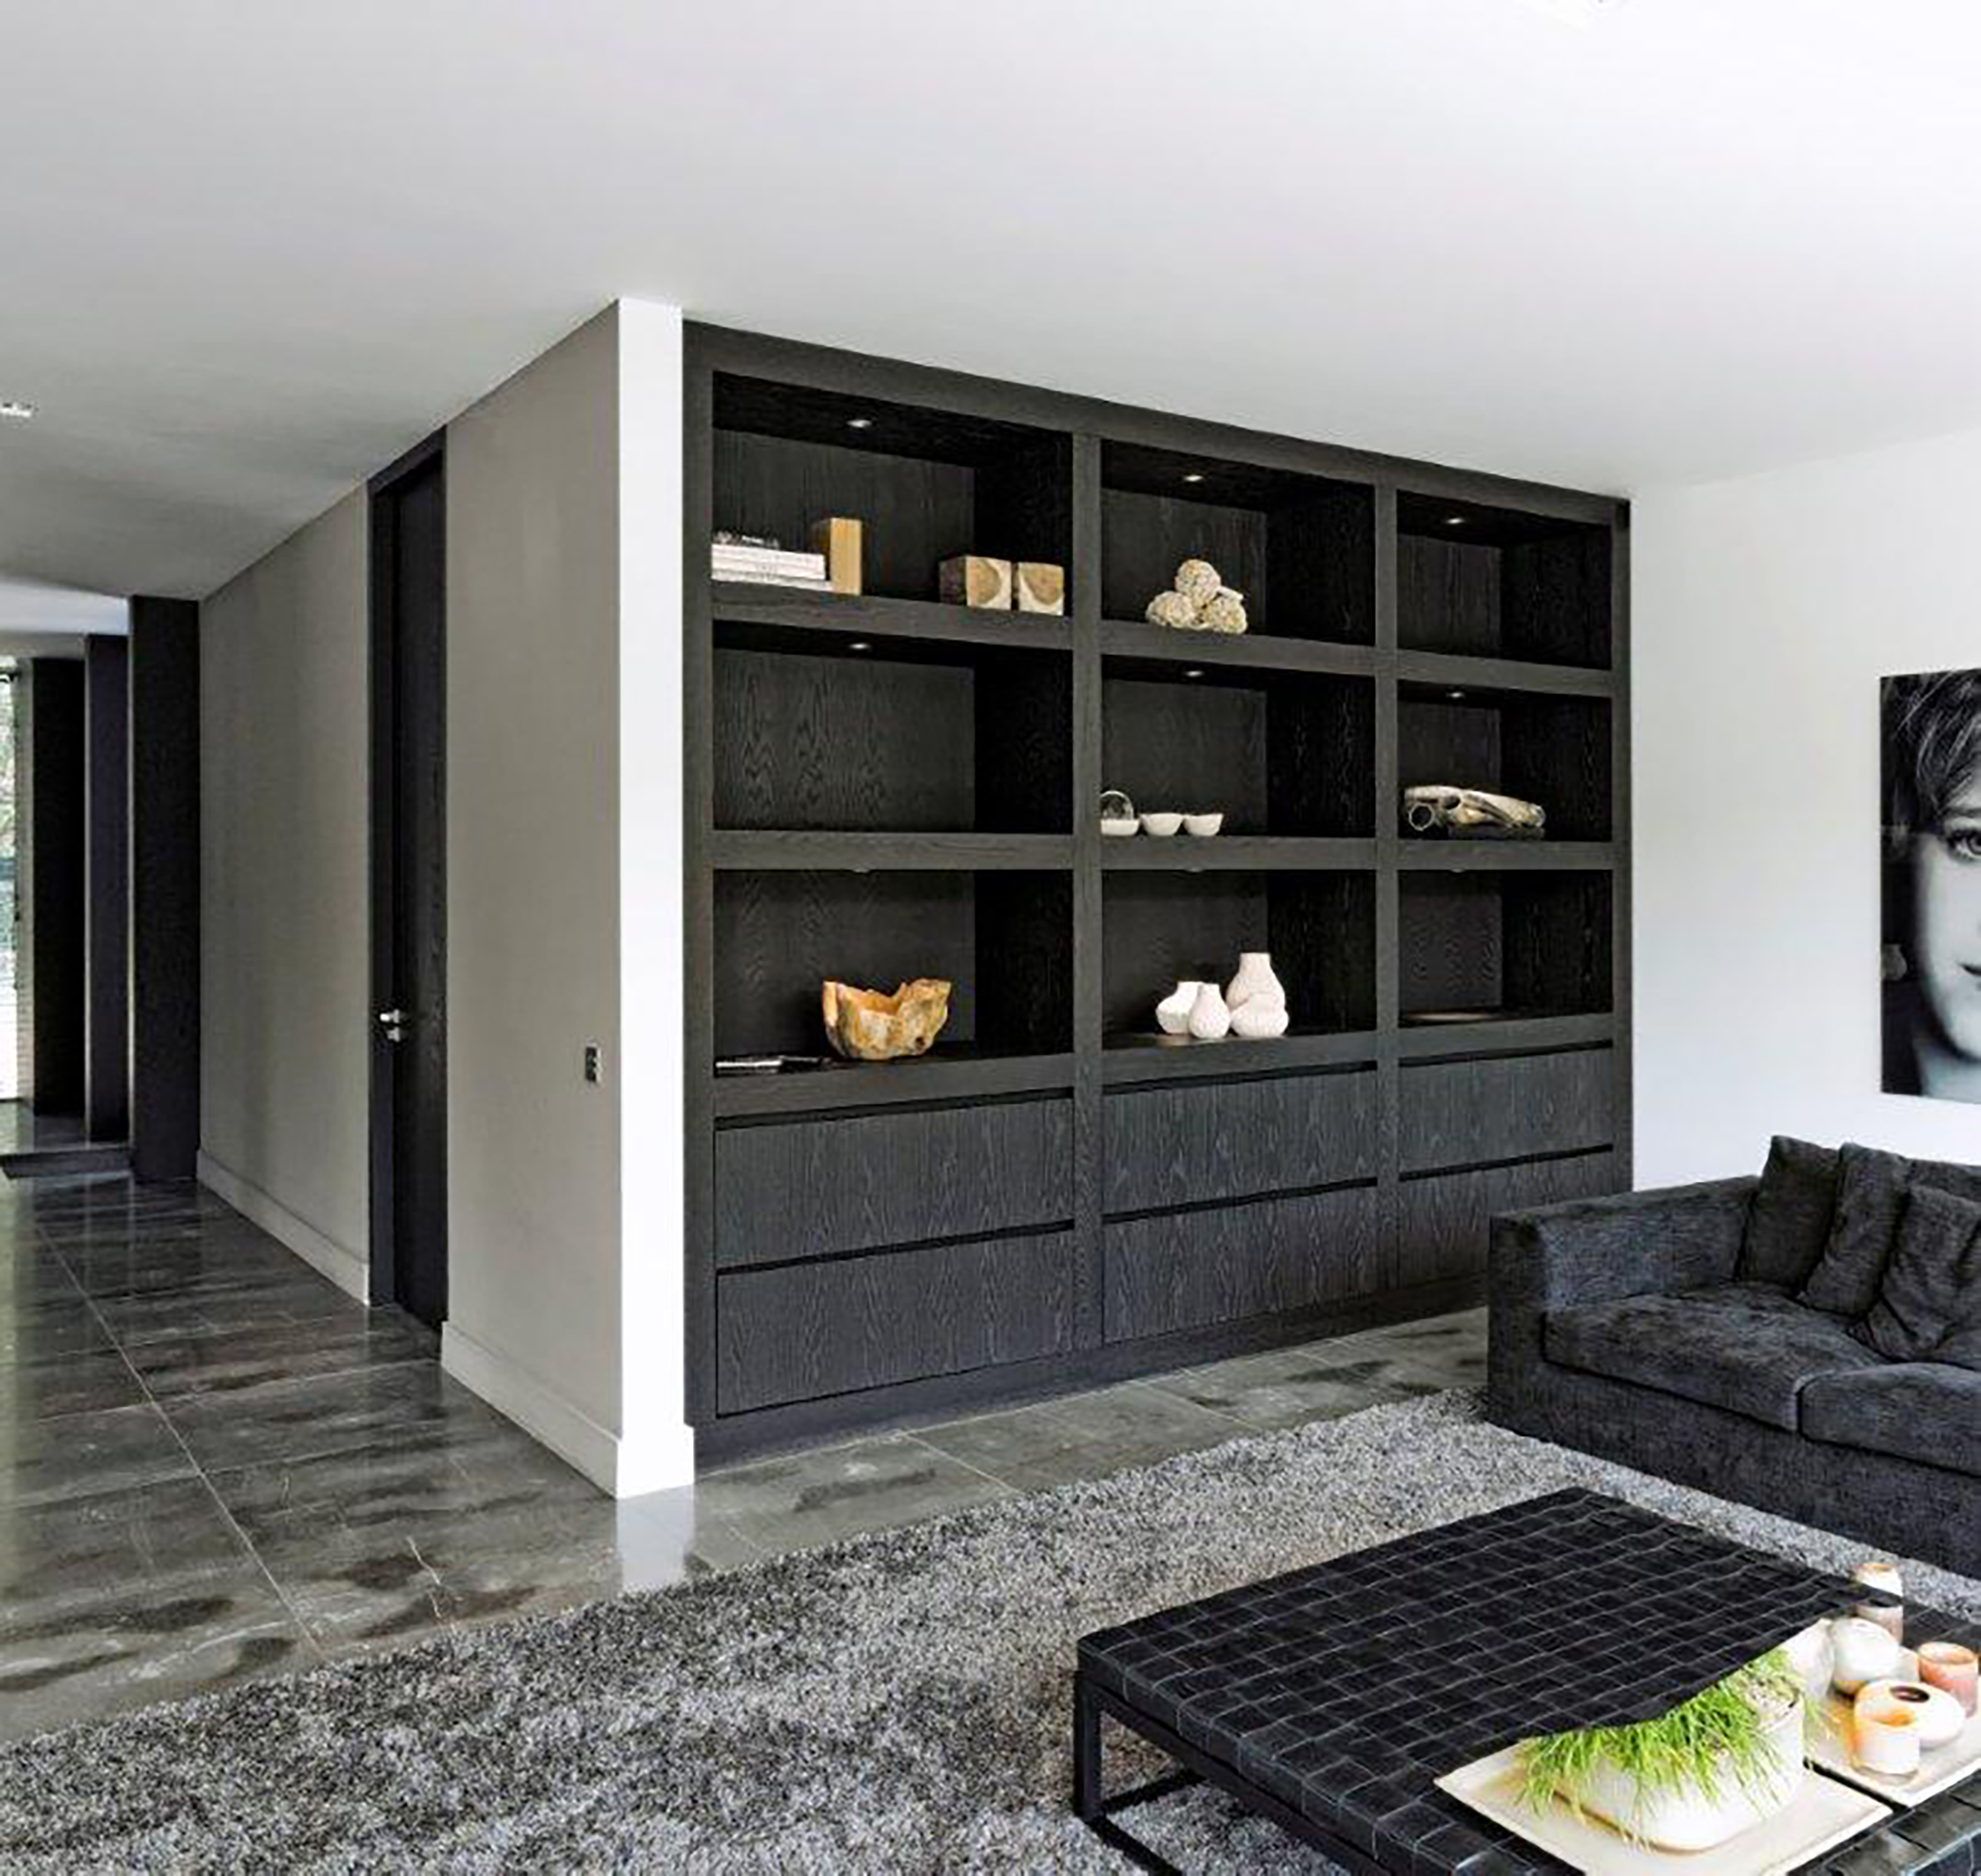 Maatwerk kasten - Eigentijdse boekenkast ...